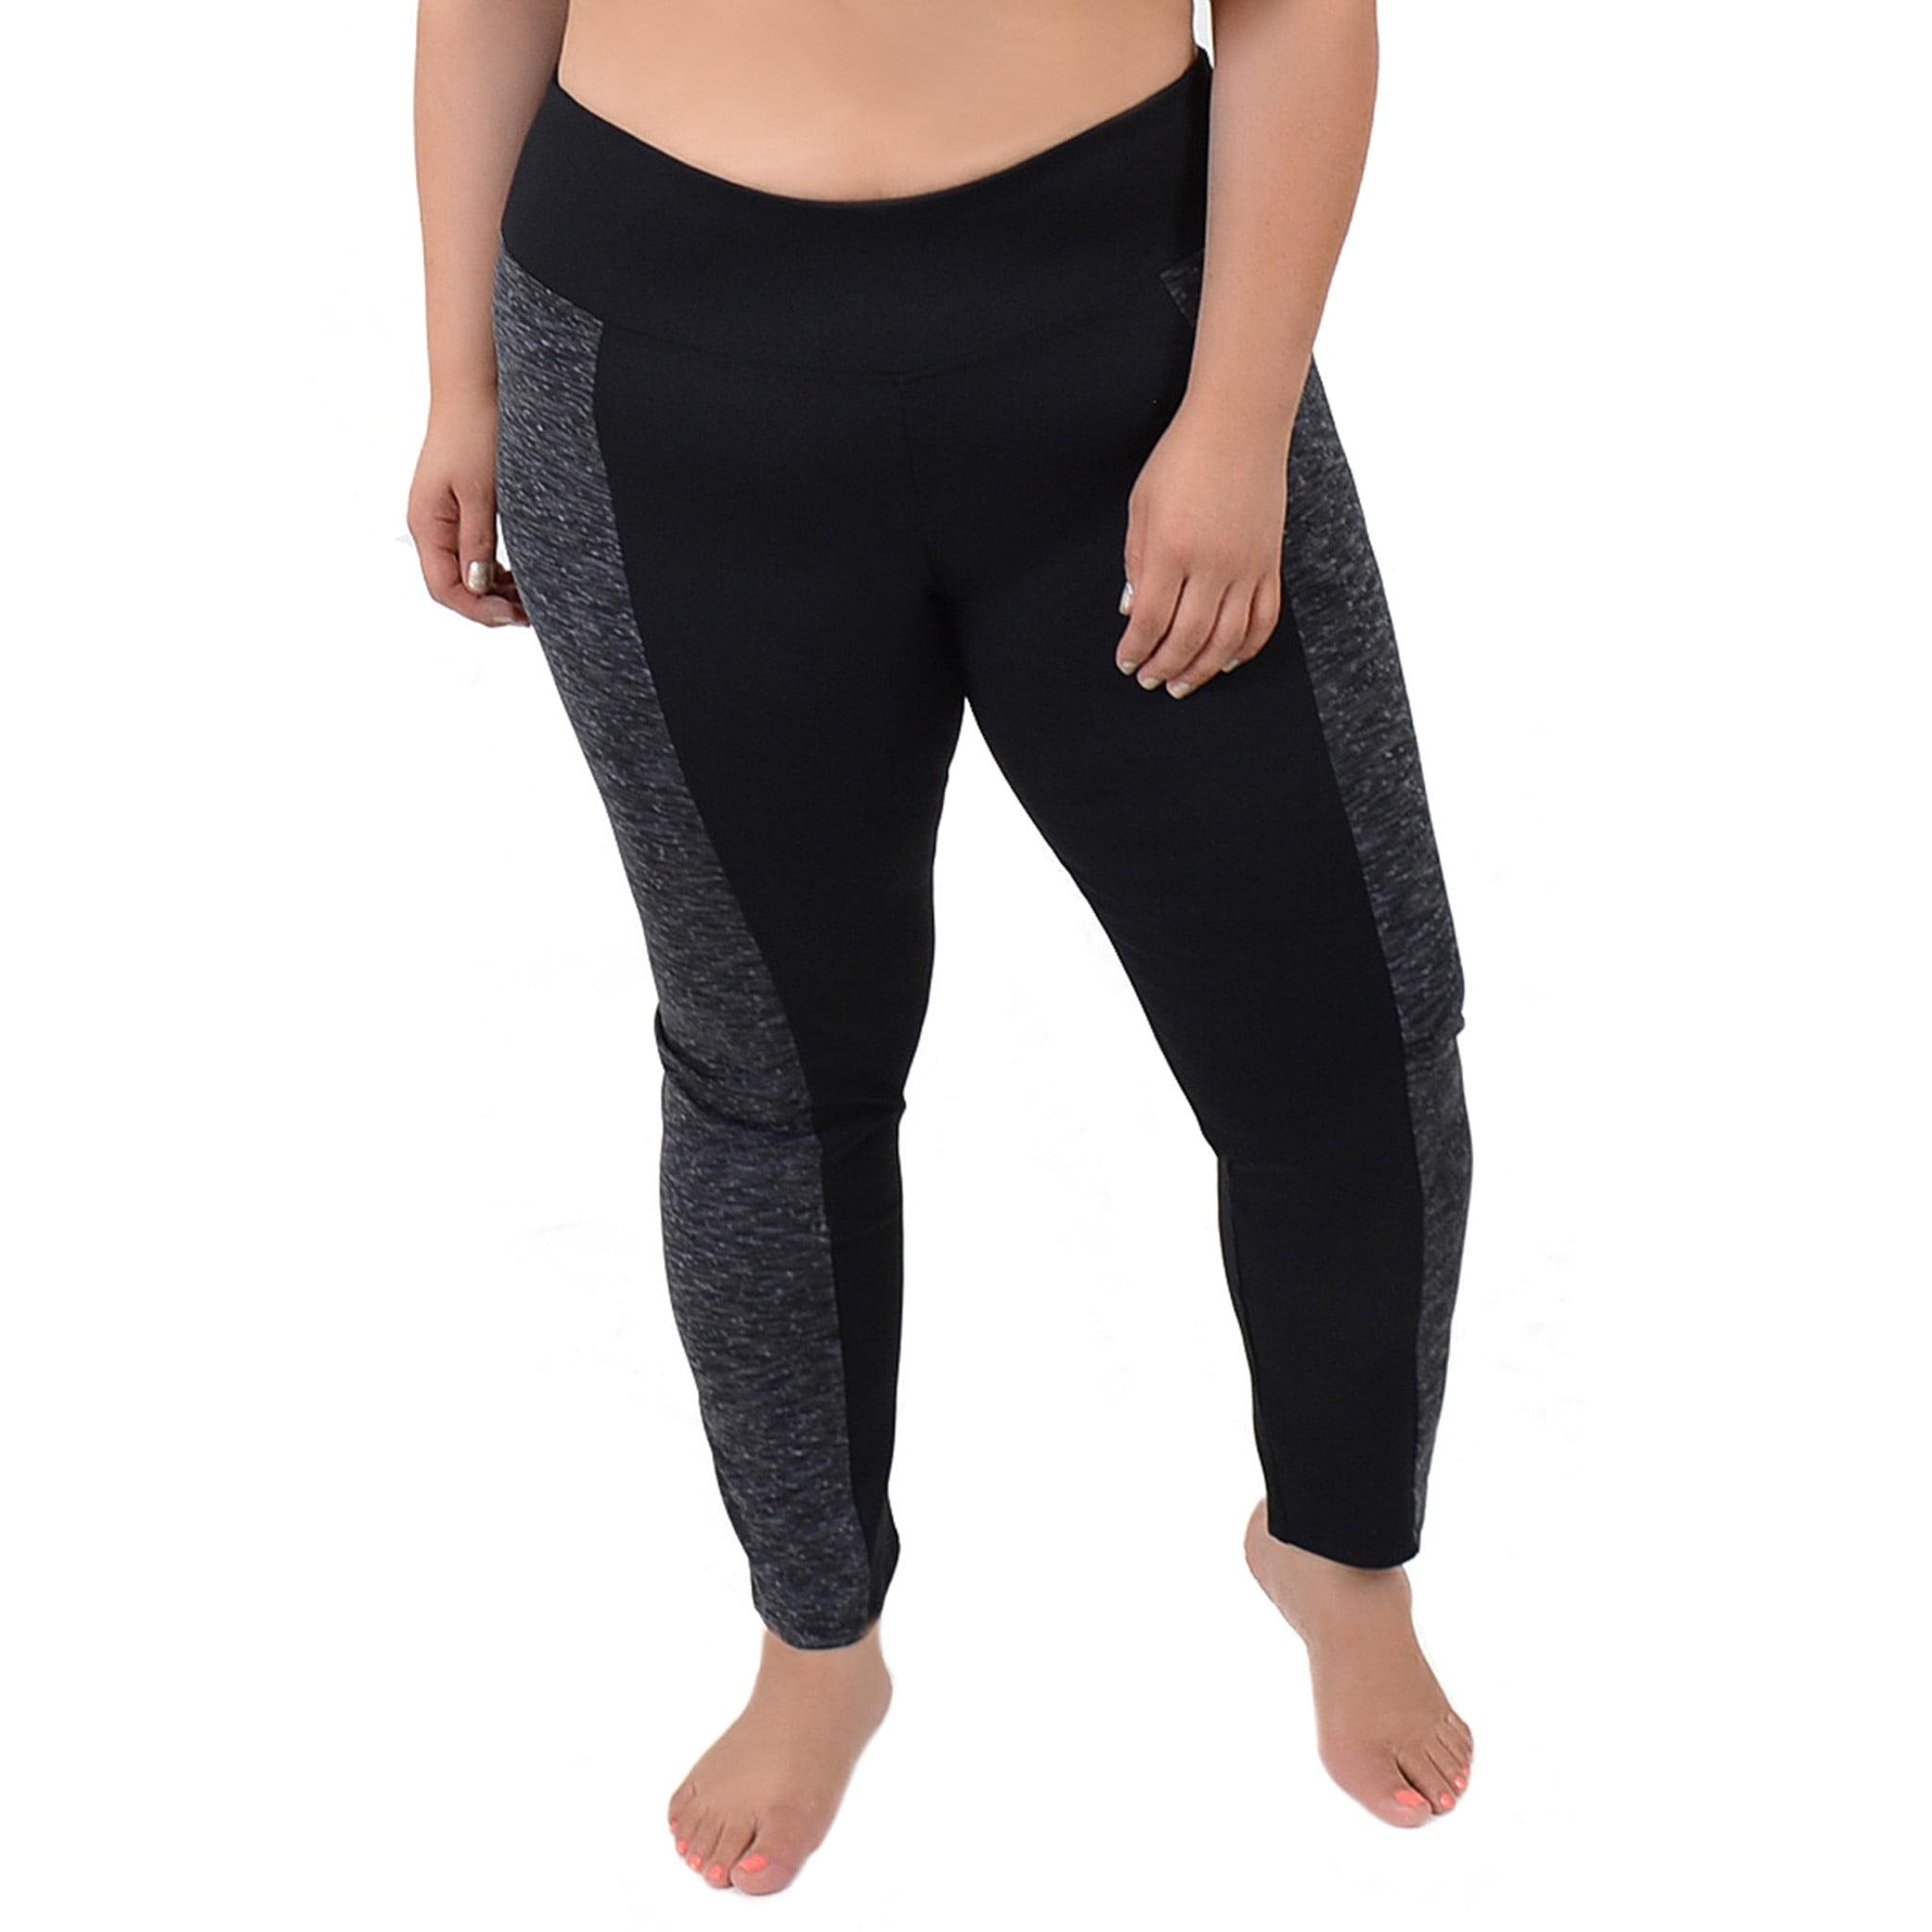 Plus Size Vicky Two-Tone Leggings - XXX-Large (20-22) / B...